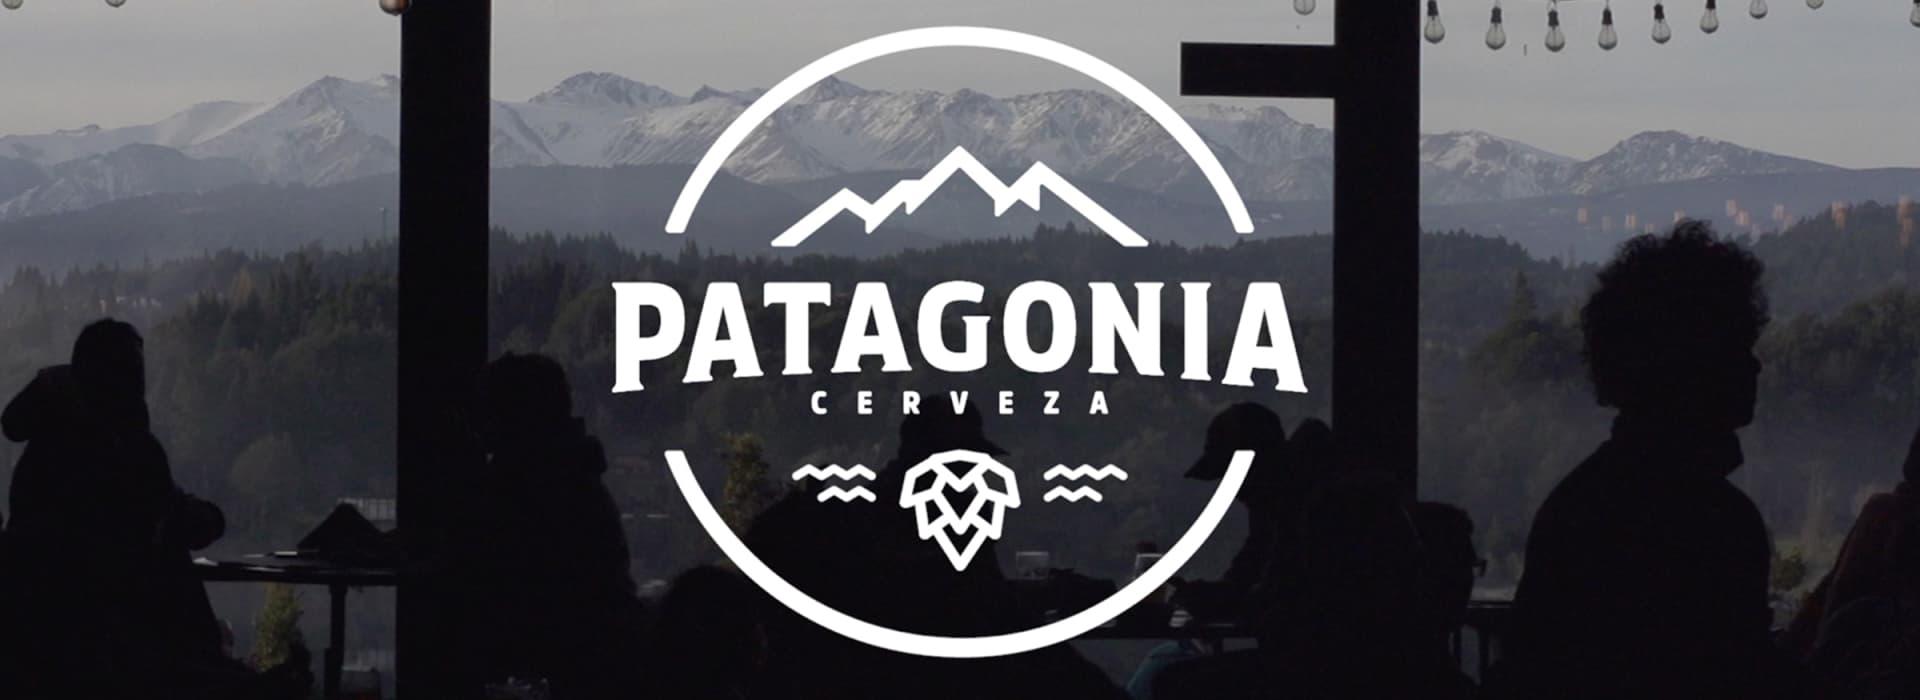 Patagonia Identity   Work   R/GA